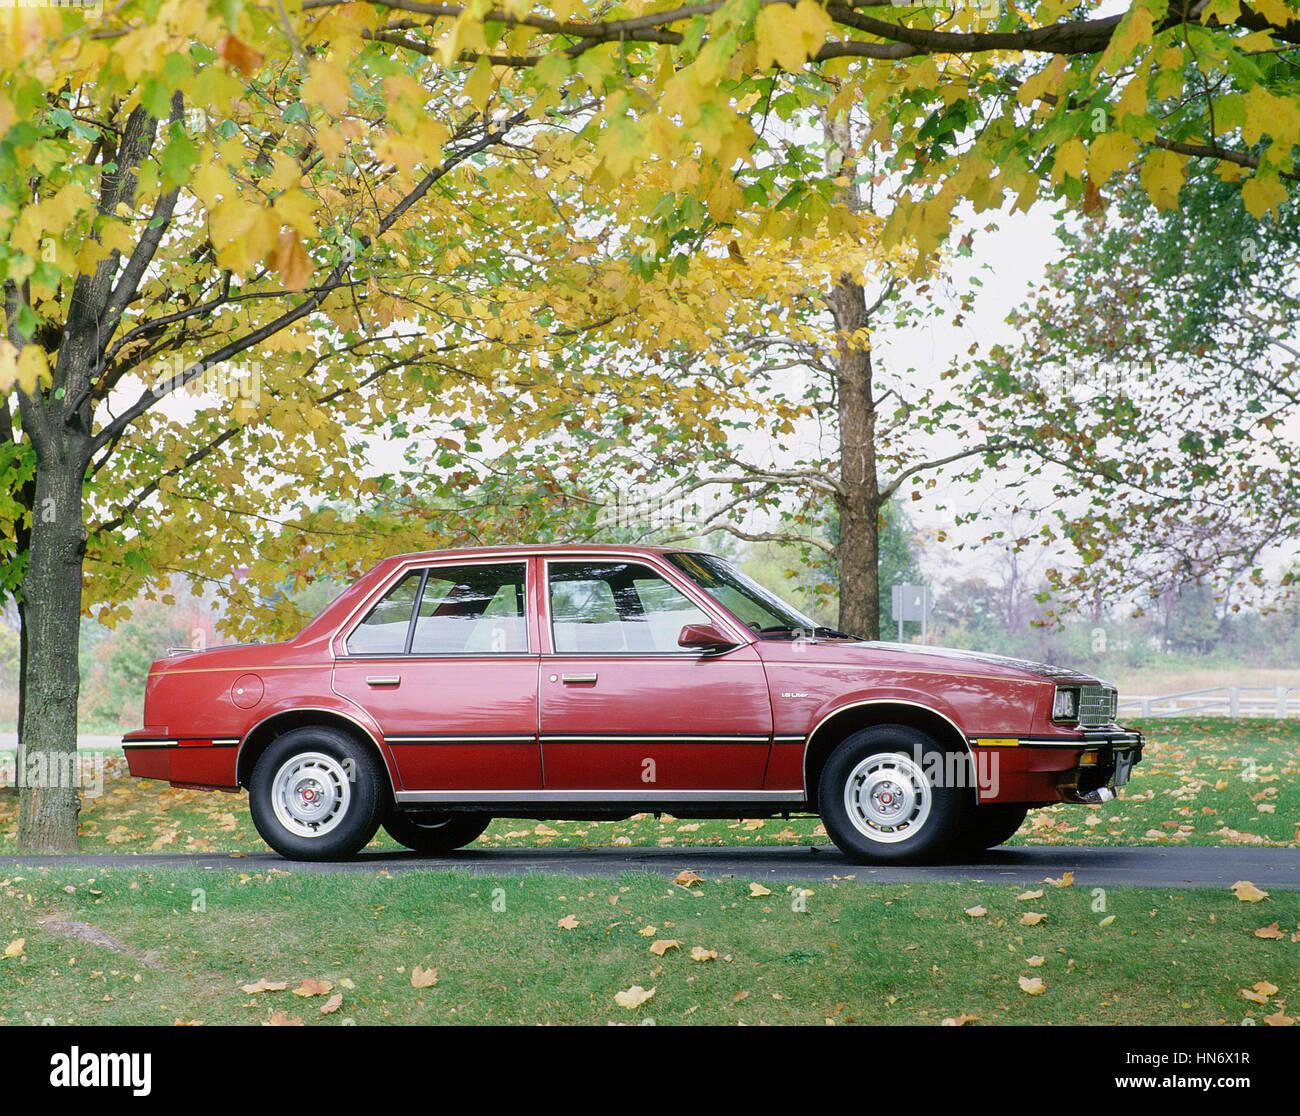 1983 Cadillac Cimarron Photo Stock